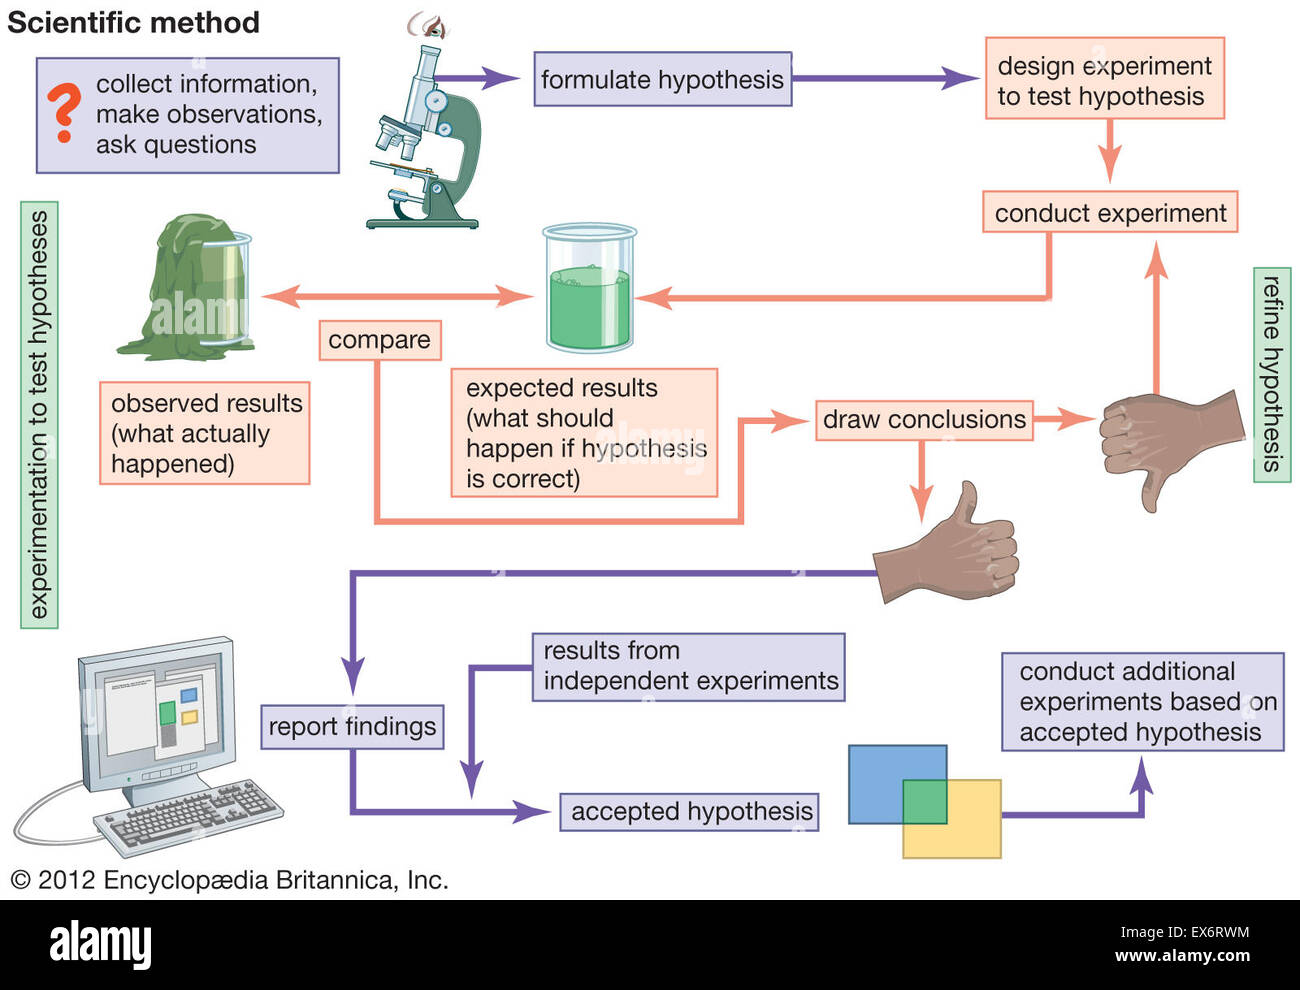 Flow Chart Of Scientific Method Stock Photo